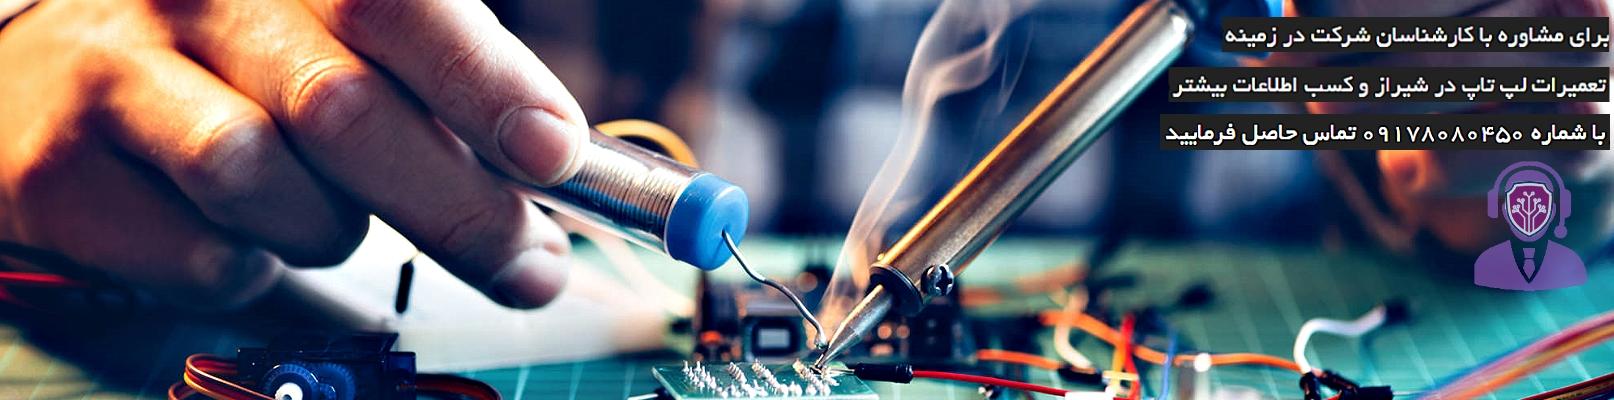 laptop-repair-Shiraz